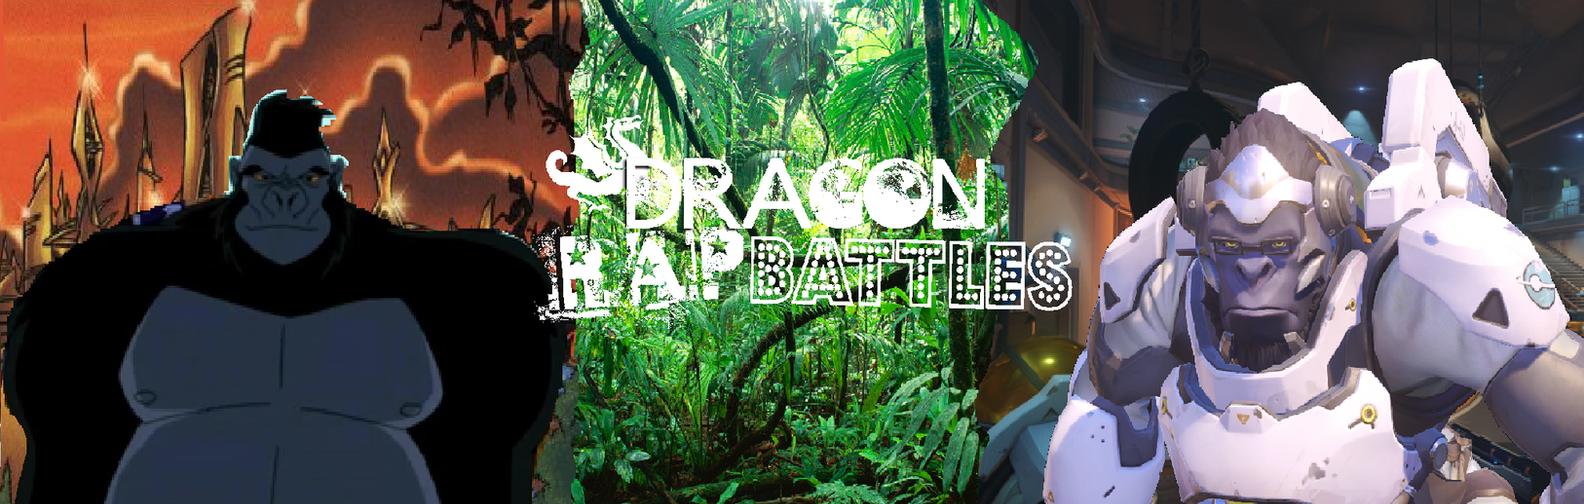 Winston VS Gorilla Grodd by dragonsblood23